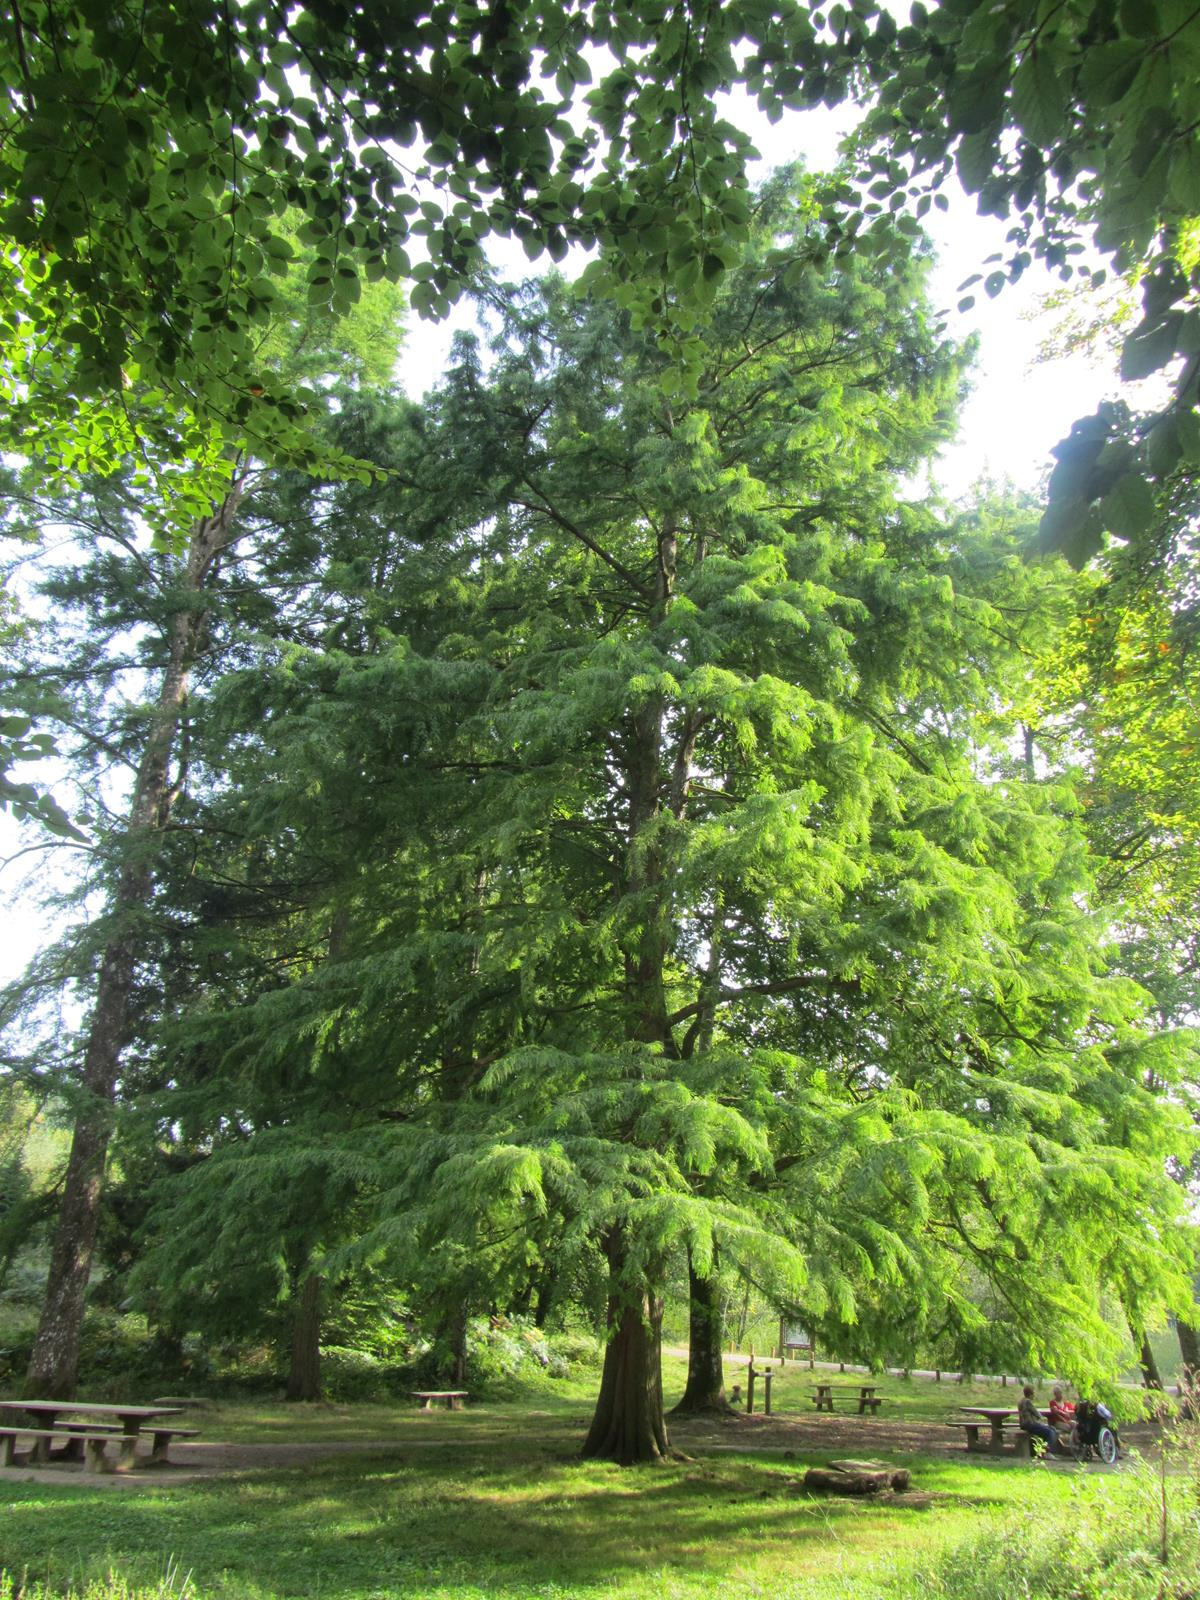 Se Cacher Des Voisins Dans Son Jardin choisir son arbre persistant | gamm vert